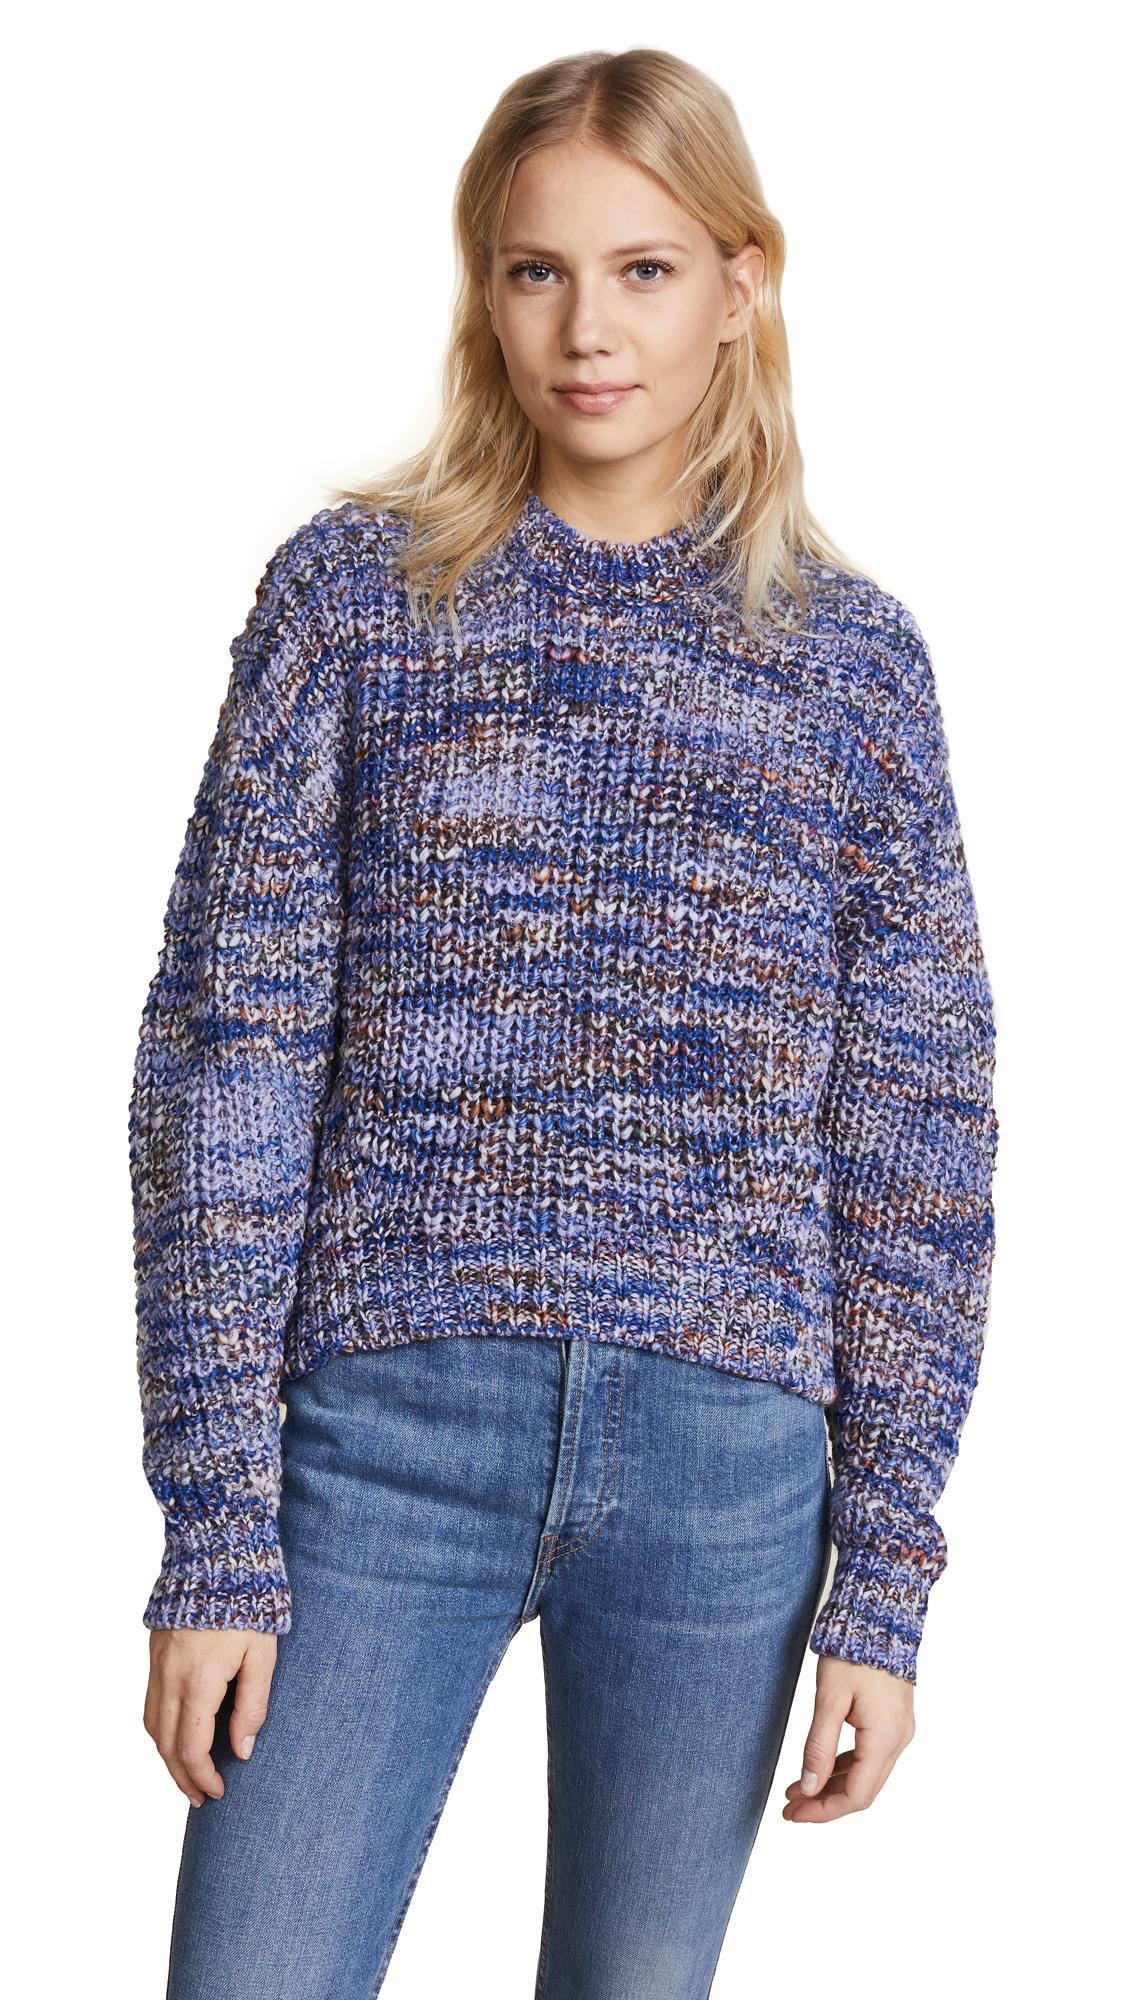 Acne Studios Zora Multi Pullover - Blue Mix